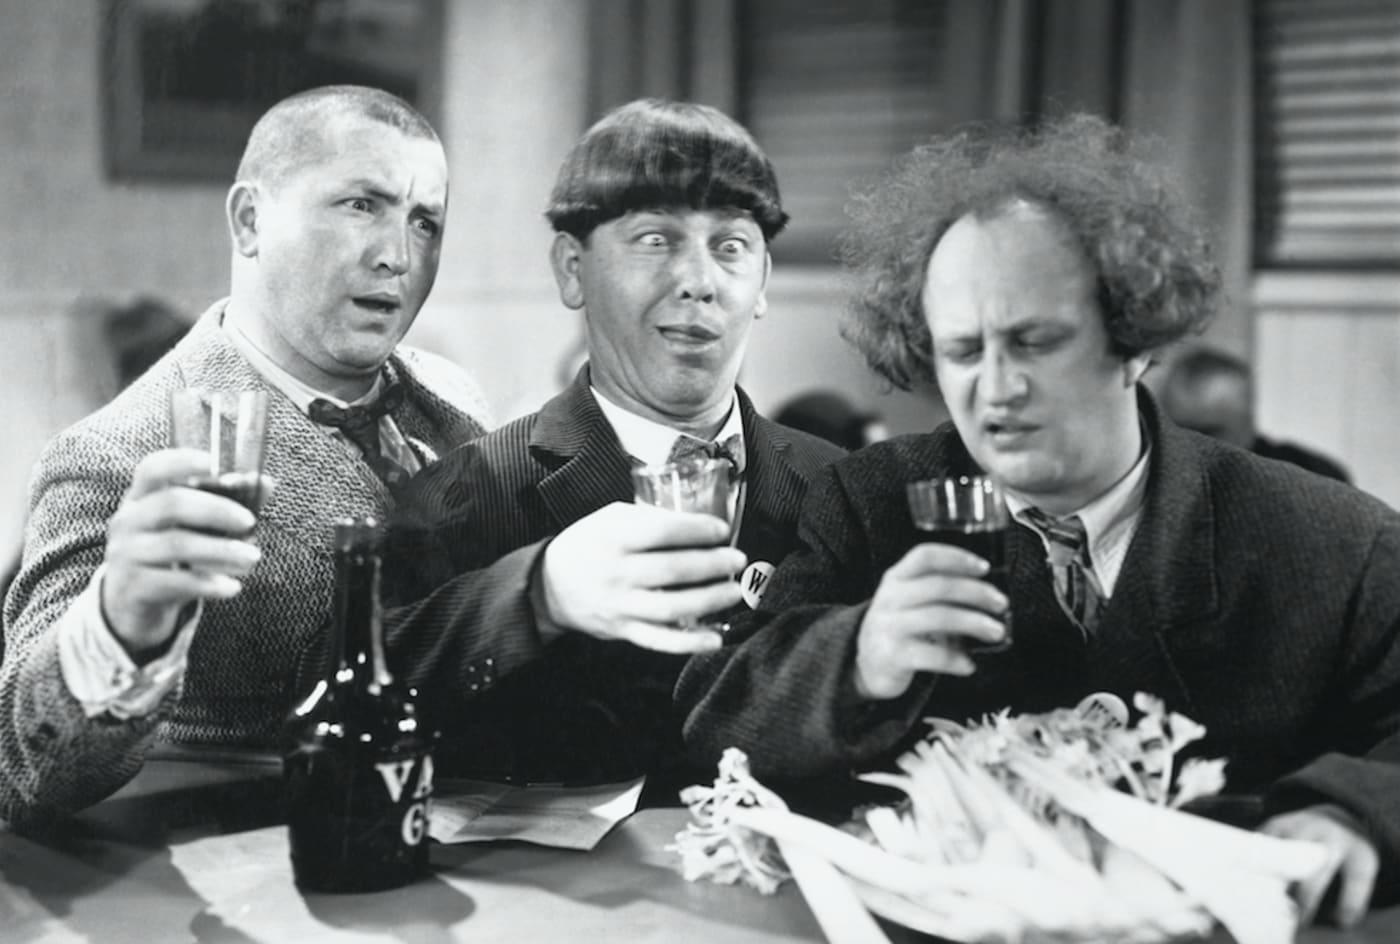 funniest tv comedies three stooges